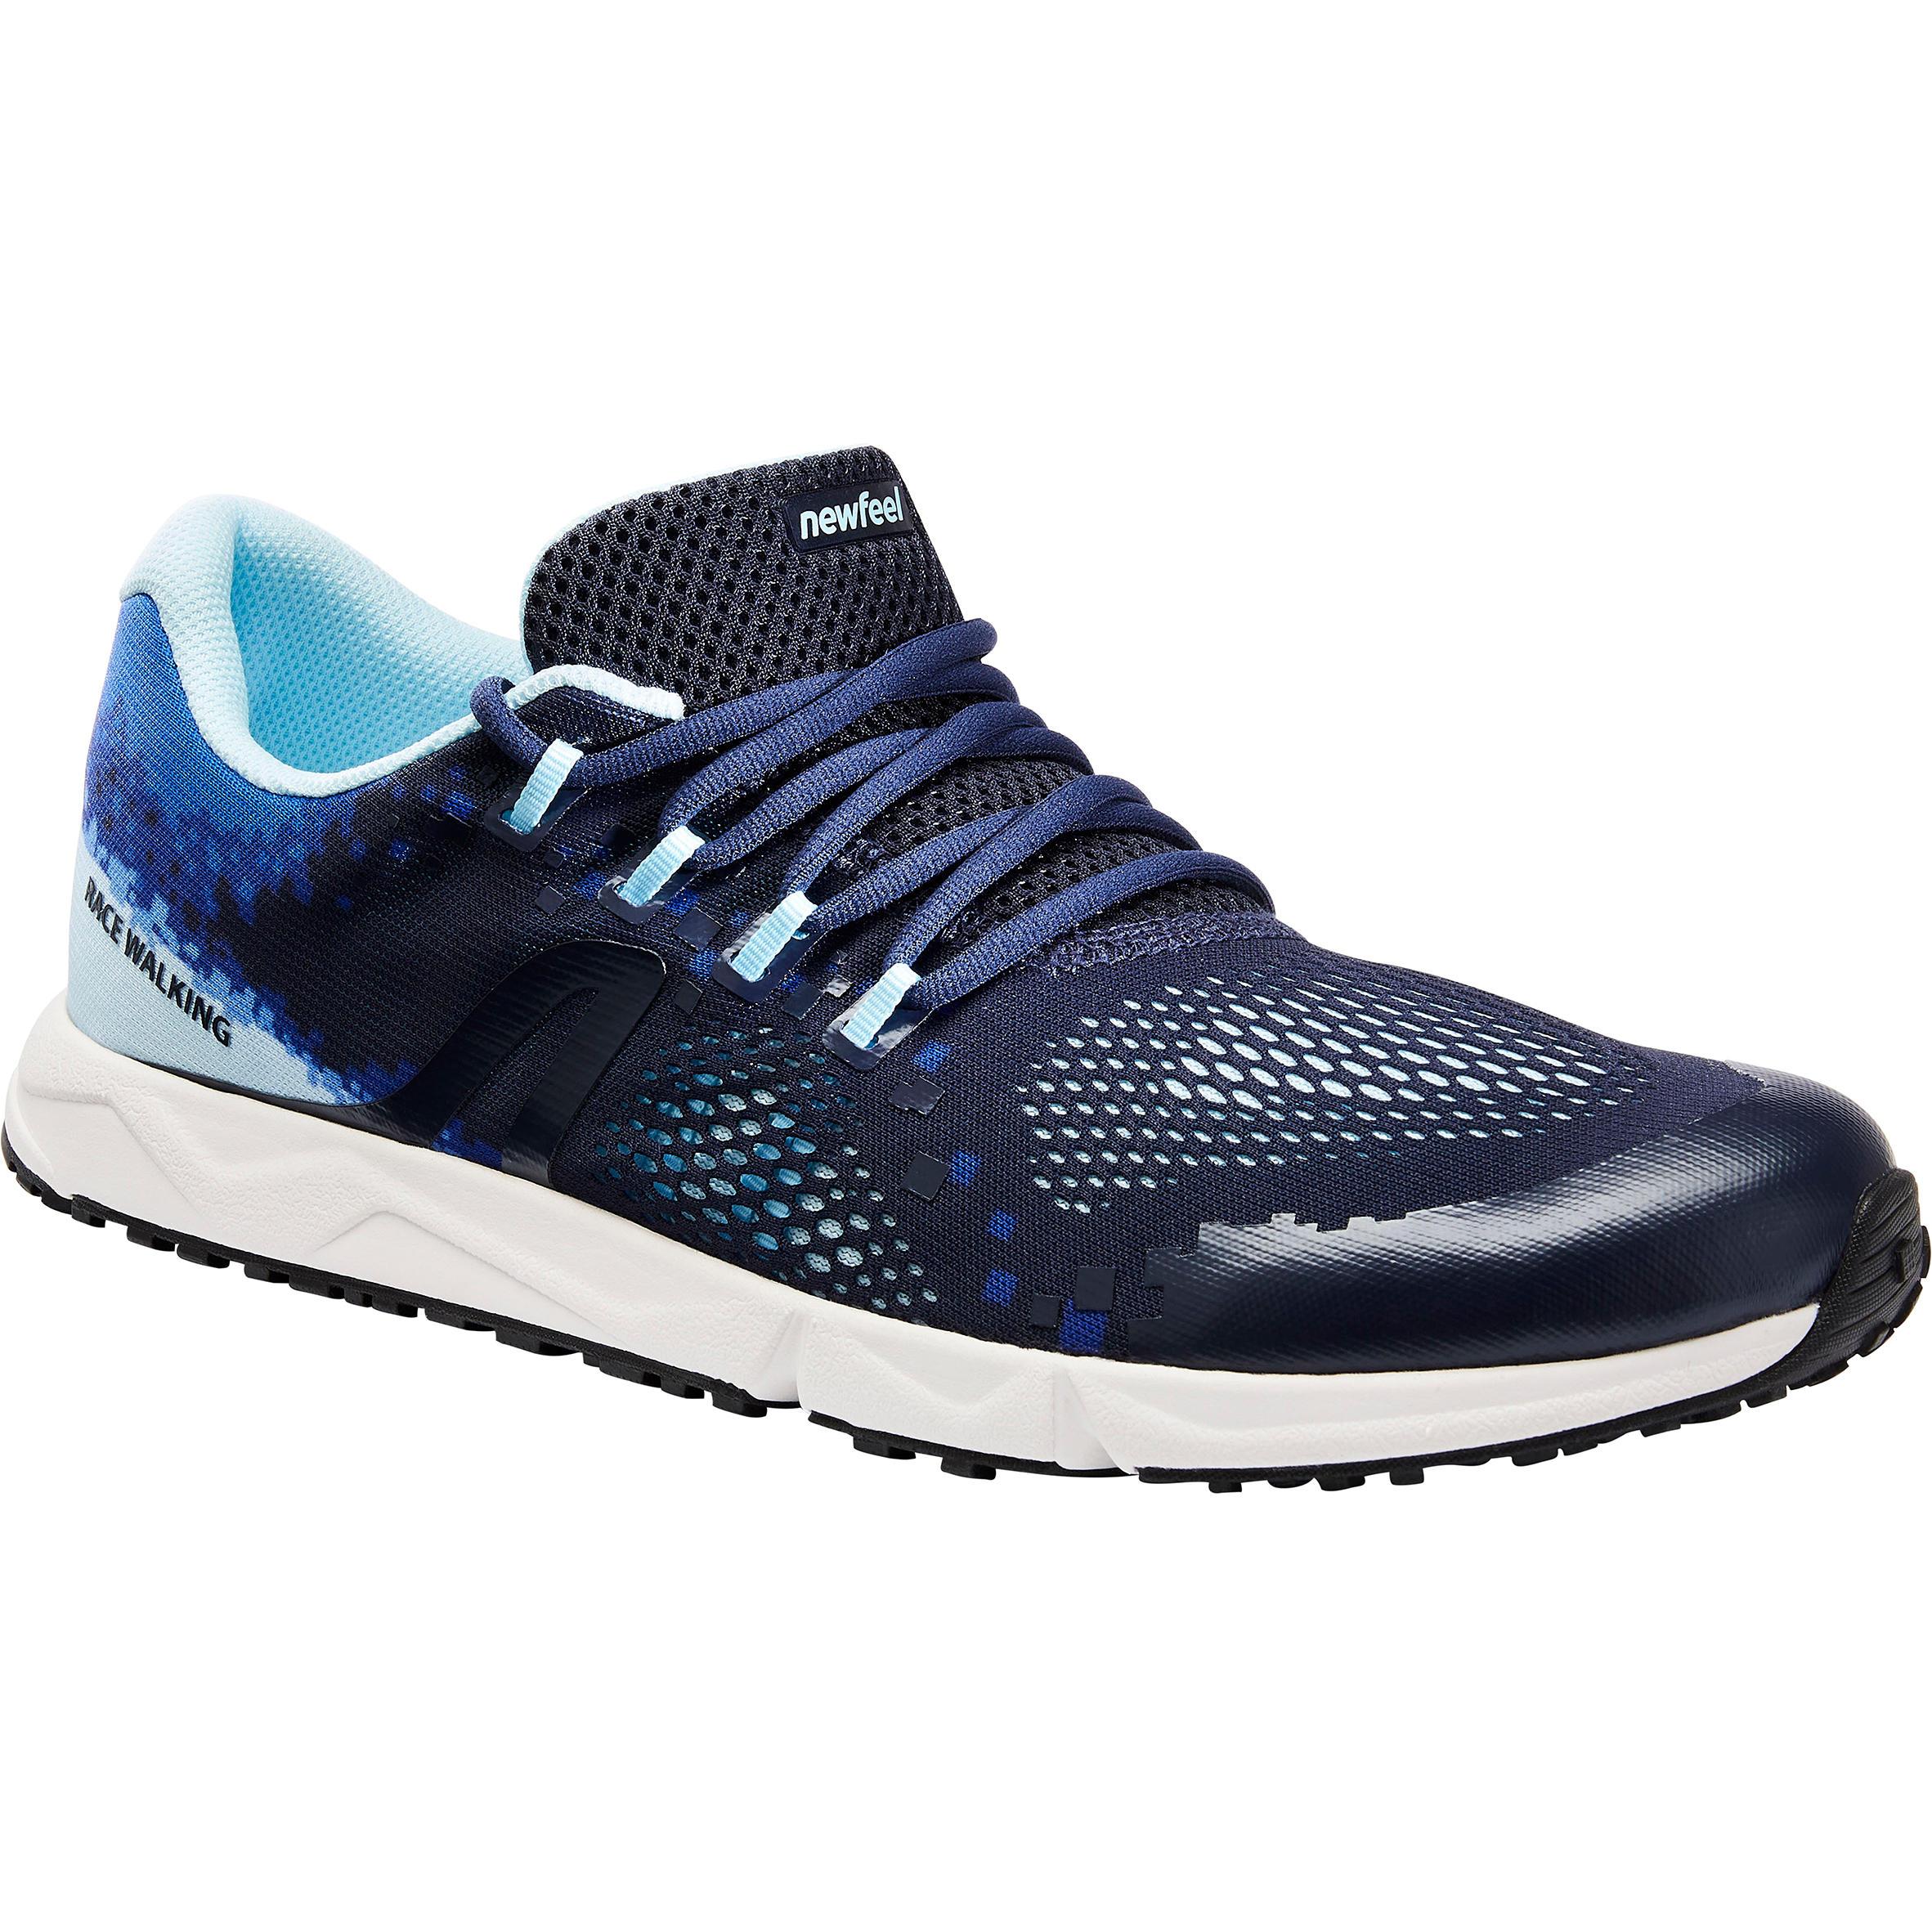 Walkingschuhe athletisches Gehen RW500 blau   Schuhe > Sportschuhe > Walkingschuhe   Newfeel